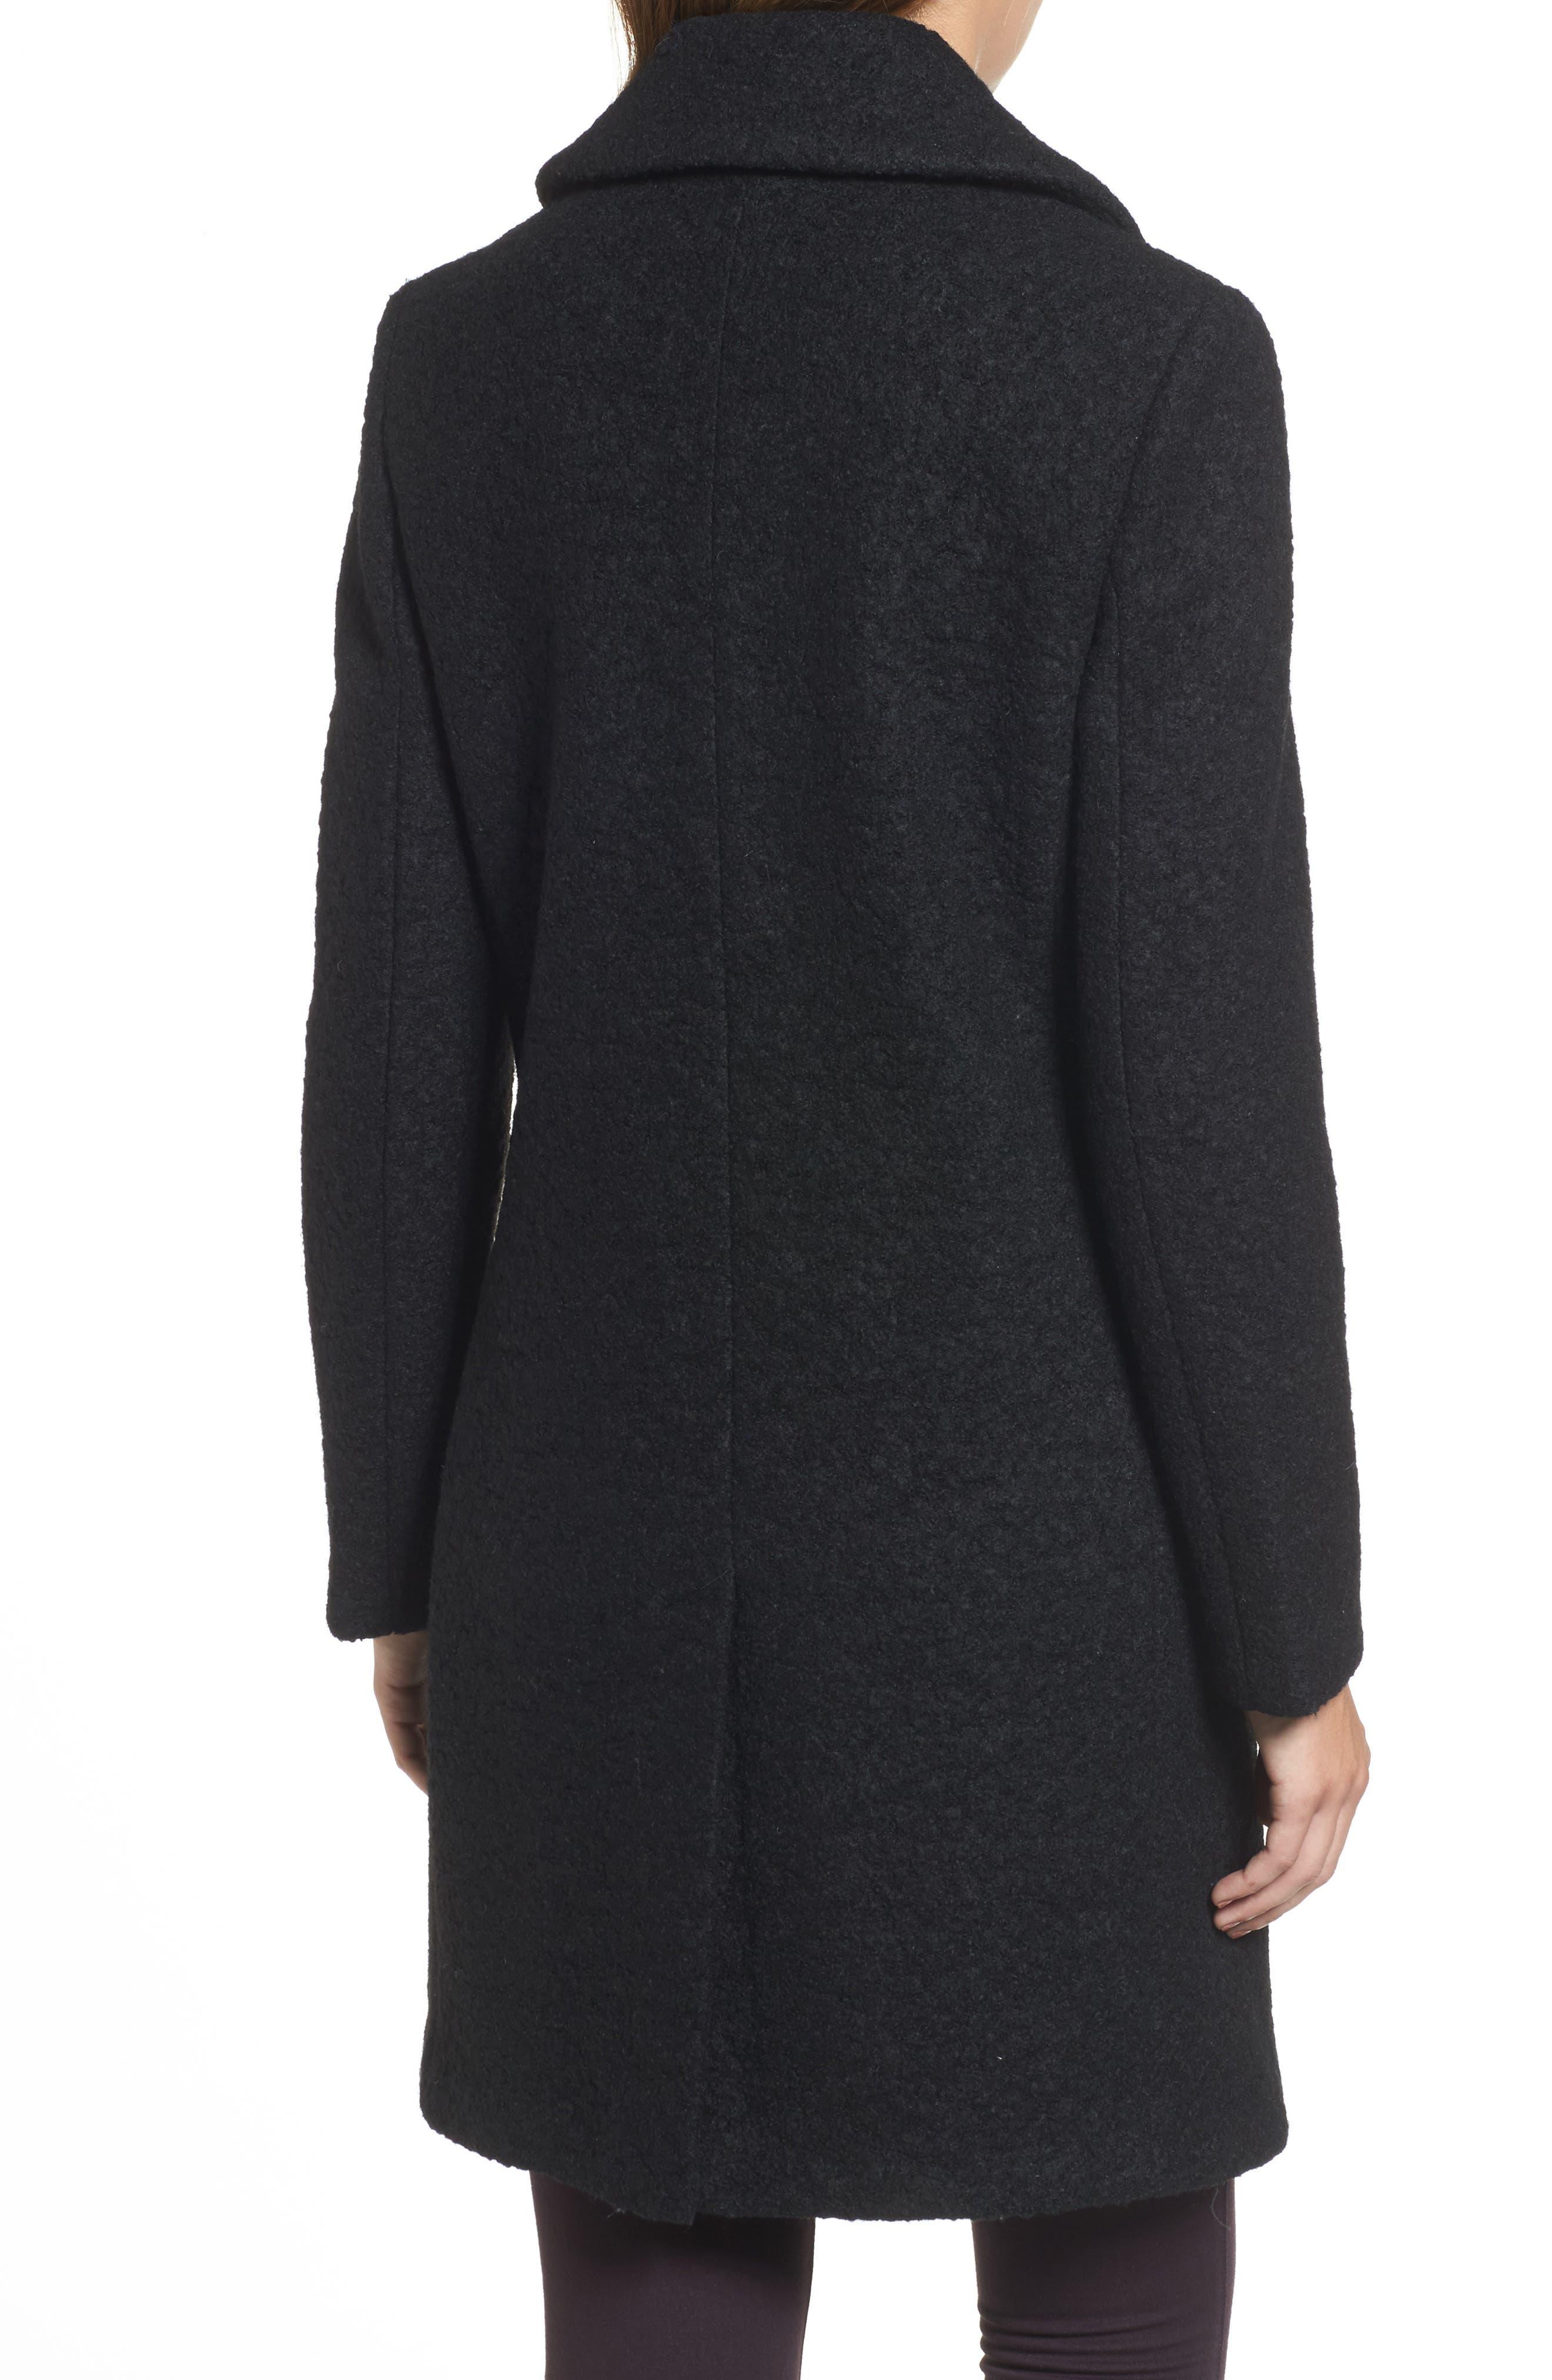 'Tessa' Boiled Wool Blend Coat,                             Alternate thumbnail 2, color,                             001